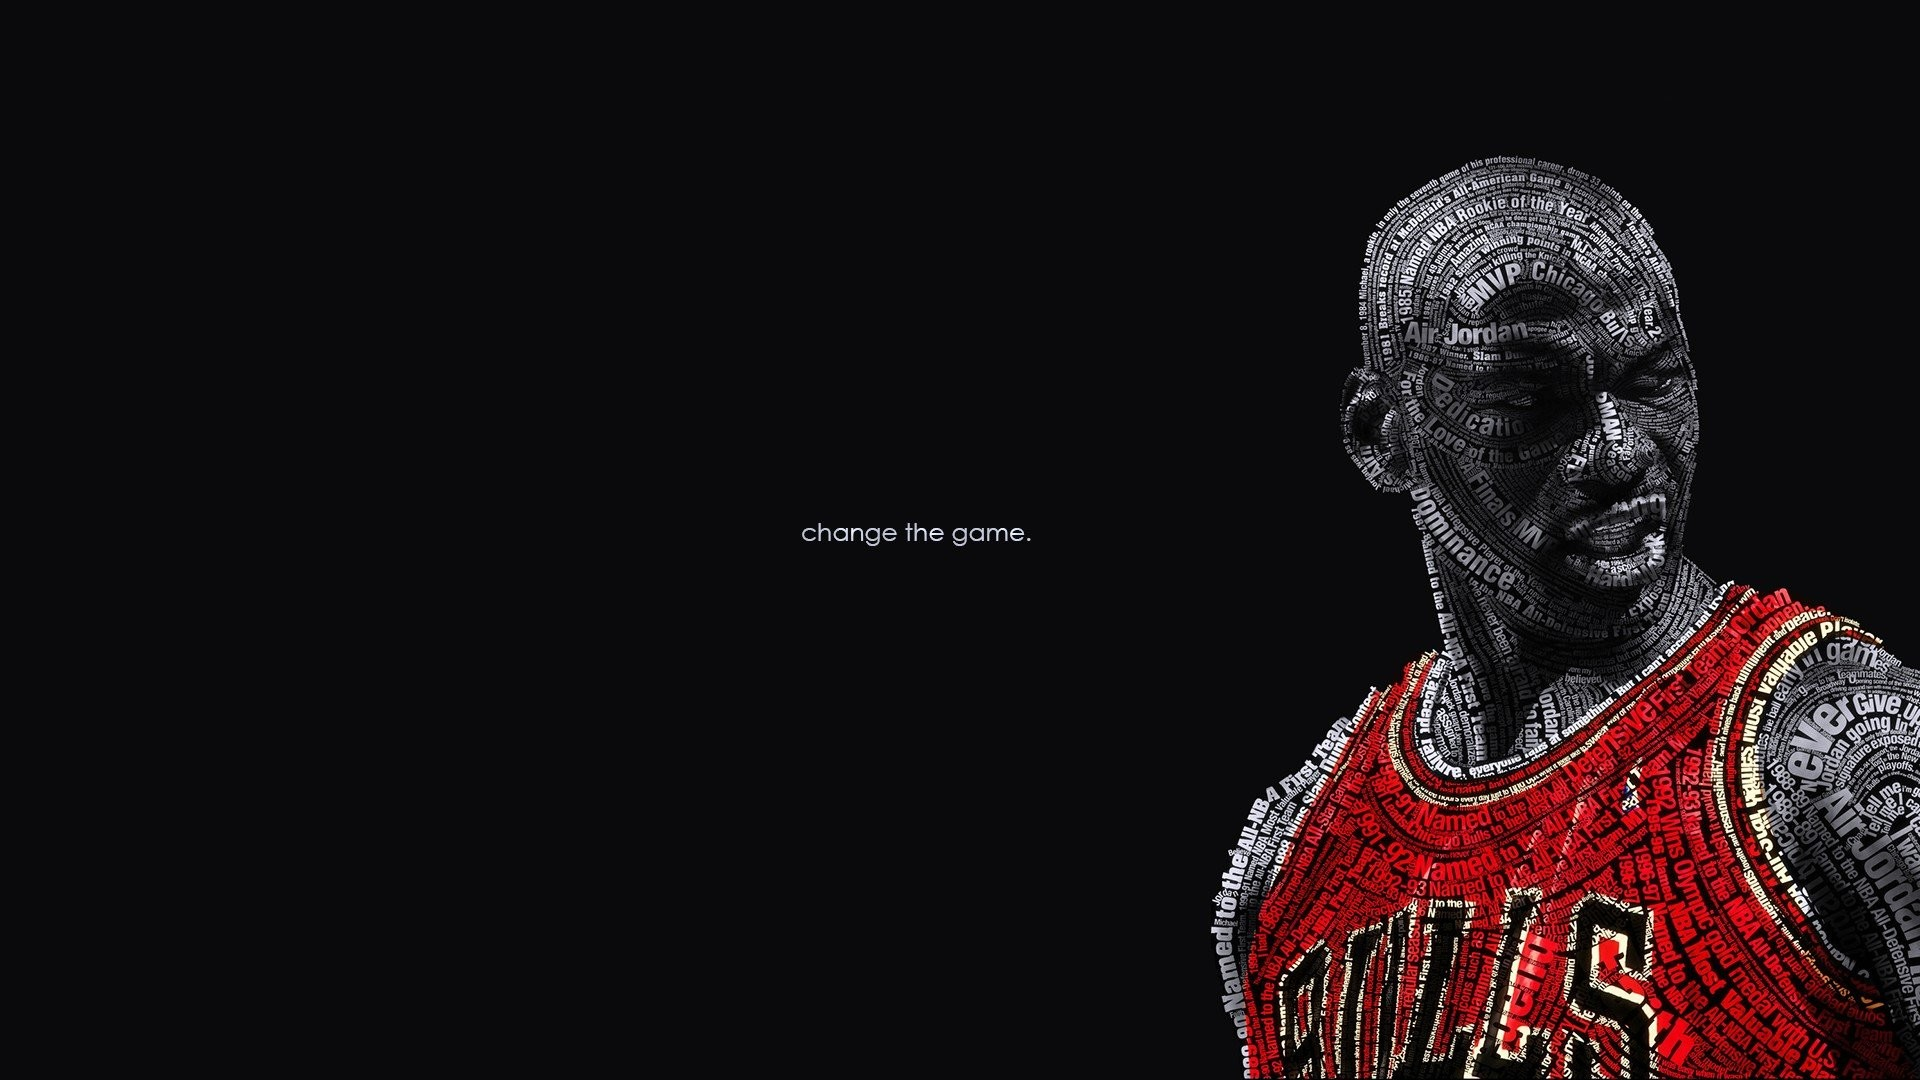 2560x1600 NBA Basketball Kobe Bryant Chicago Bulls Scottie Pippen Michael Jordan Los Angeles Lakers .